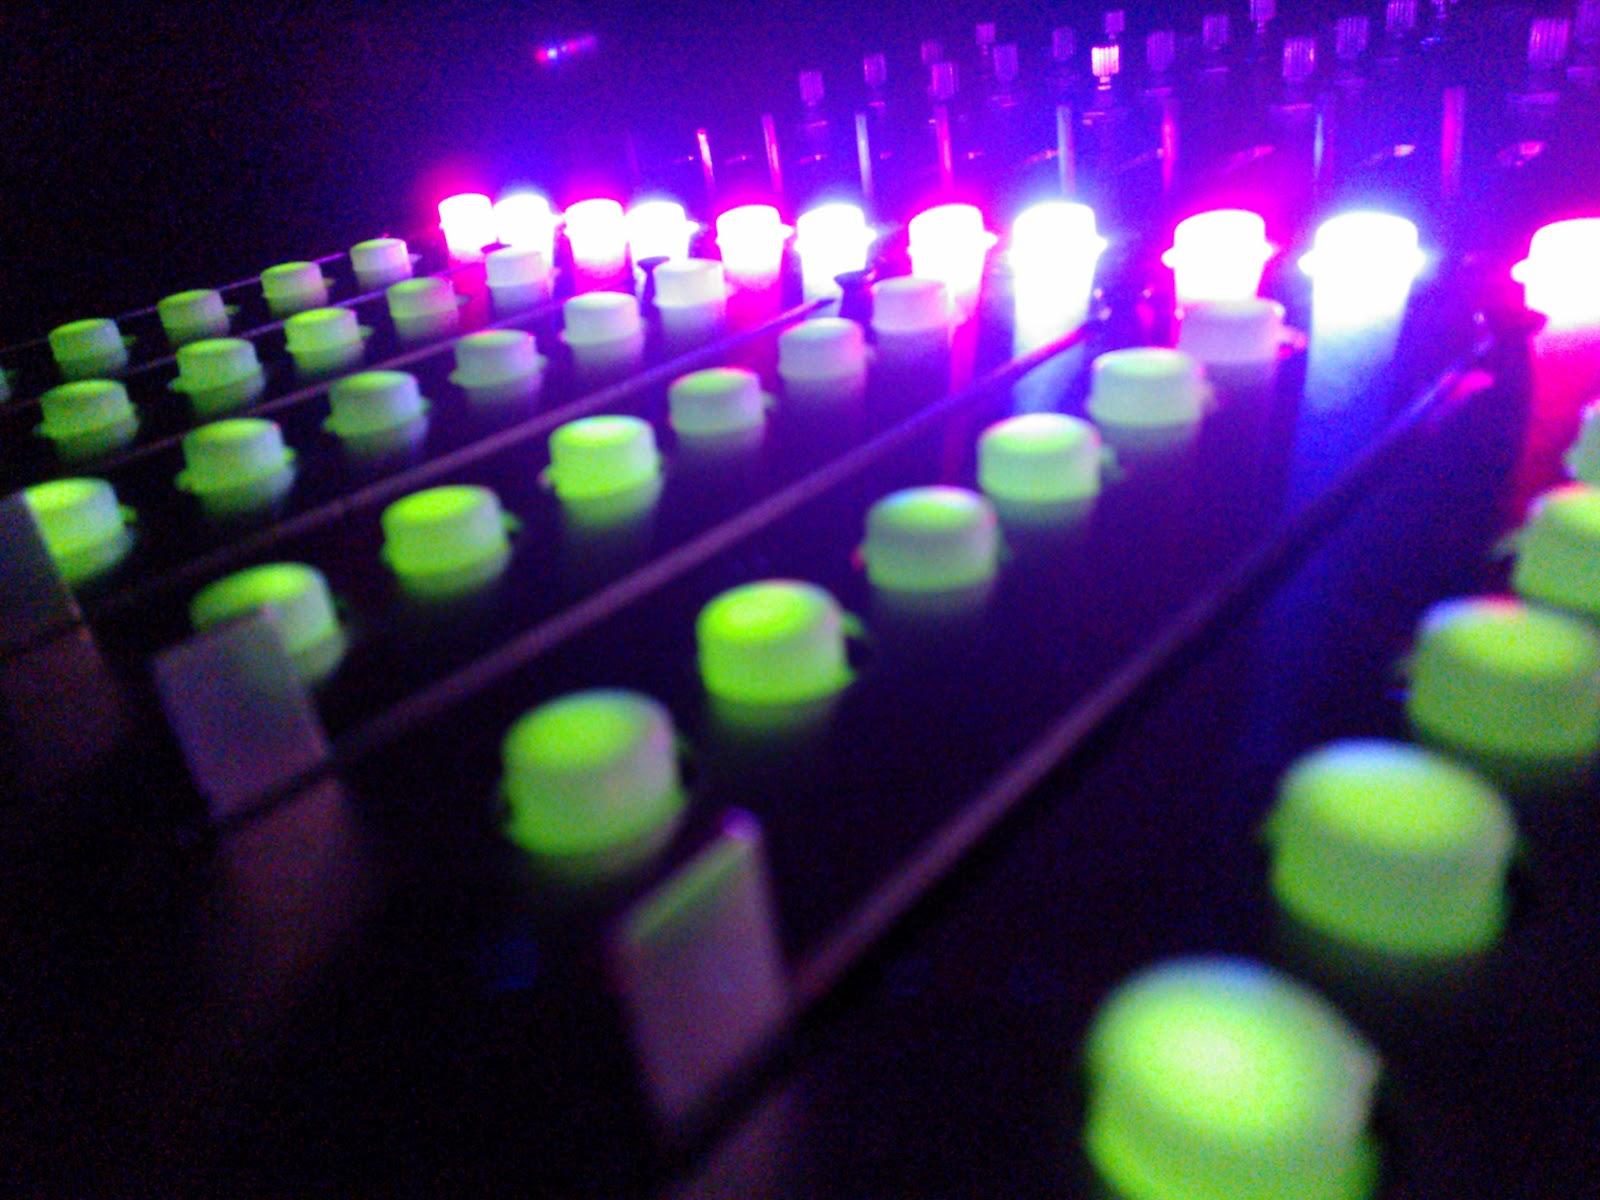 DIY Ableton Live Controller